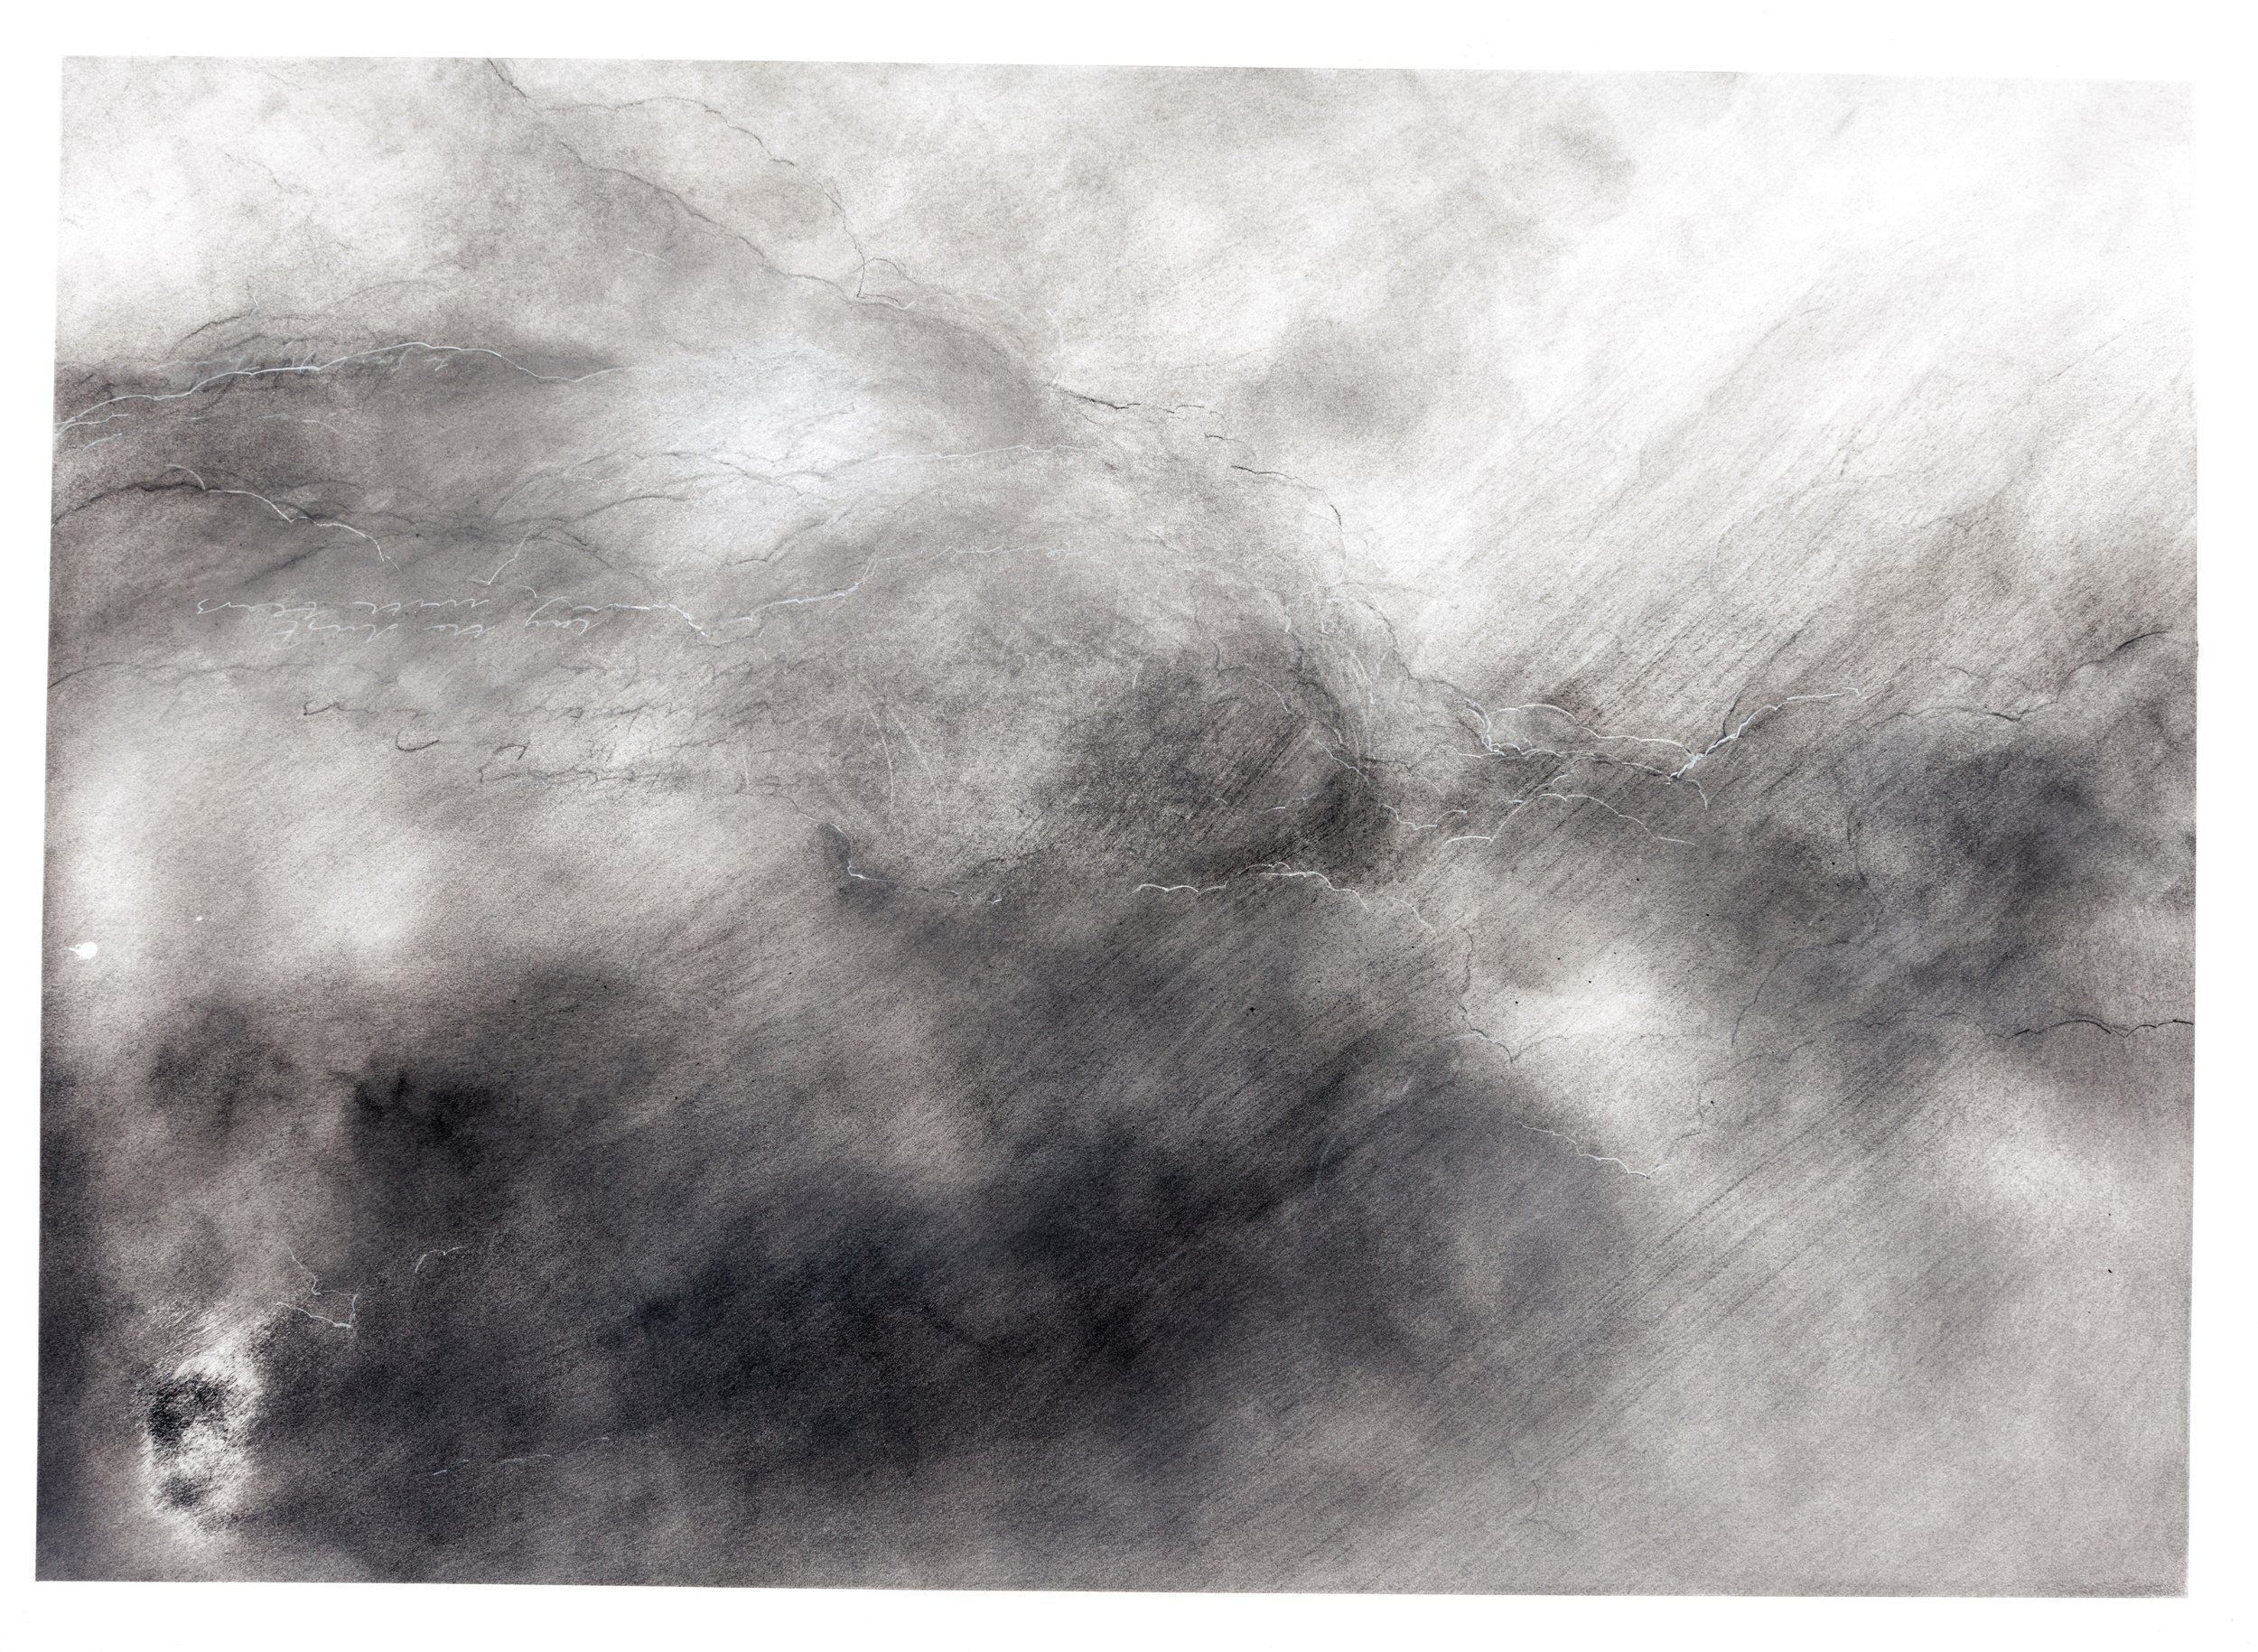 Lot 2: Tacita Dean - Lay the Dust with Tears